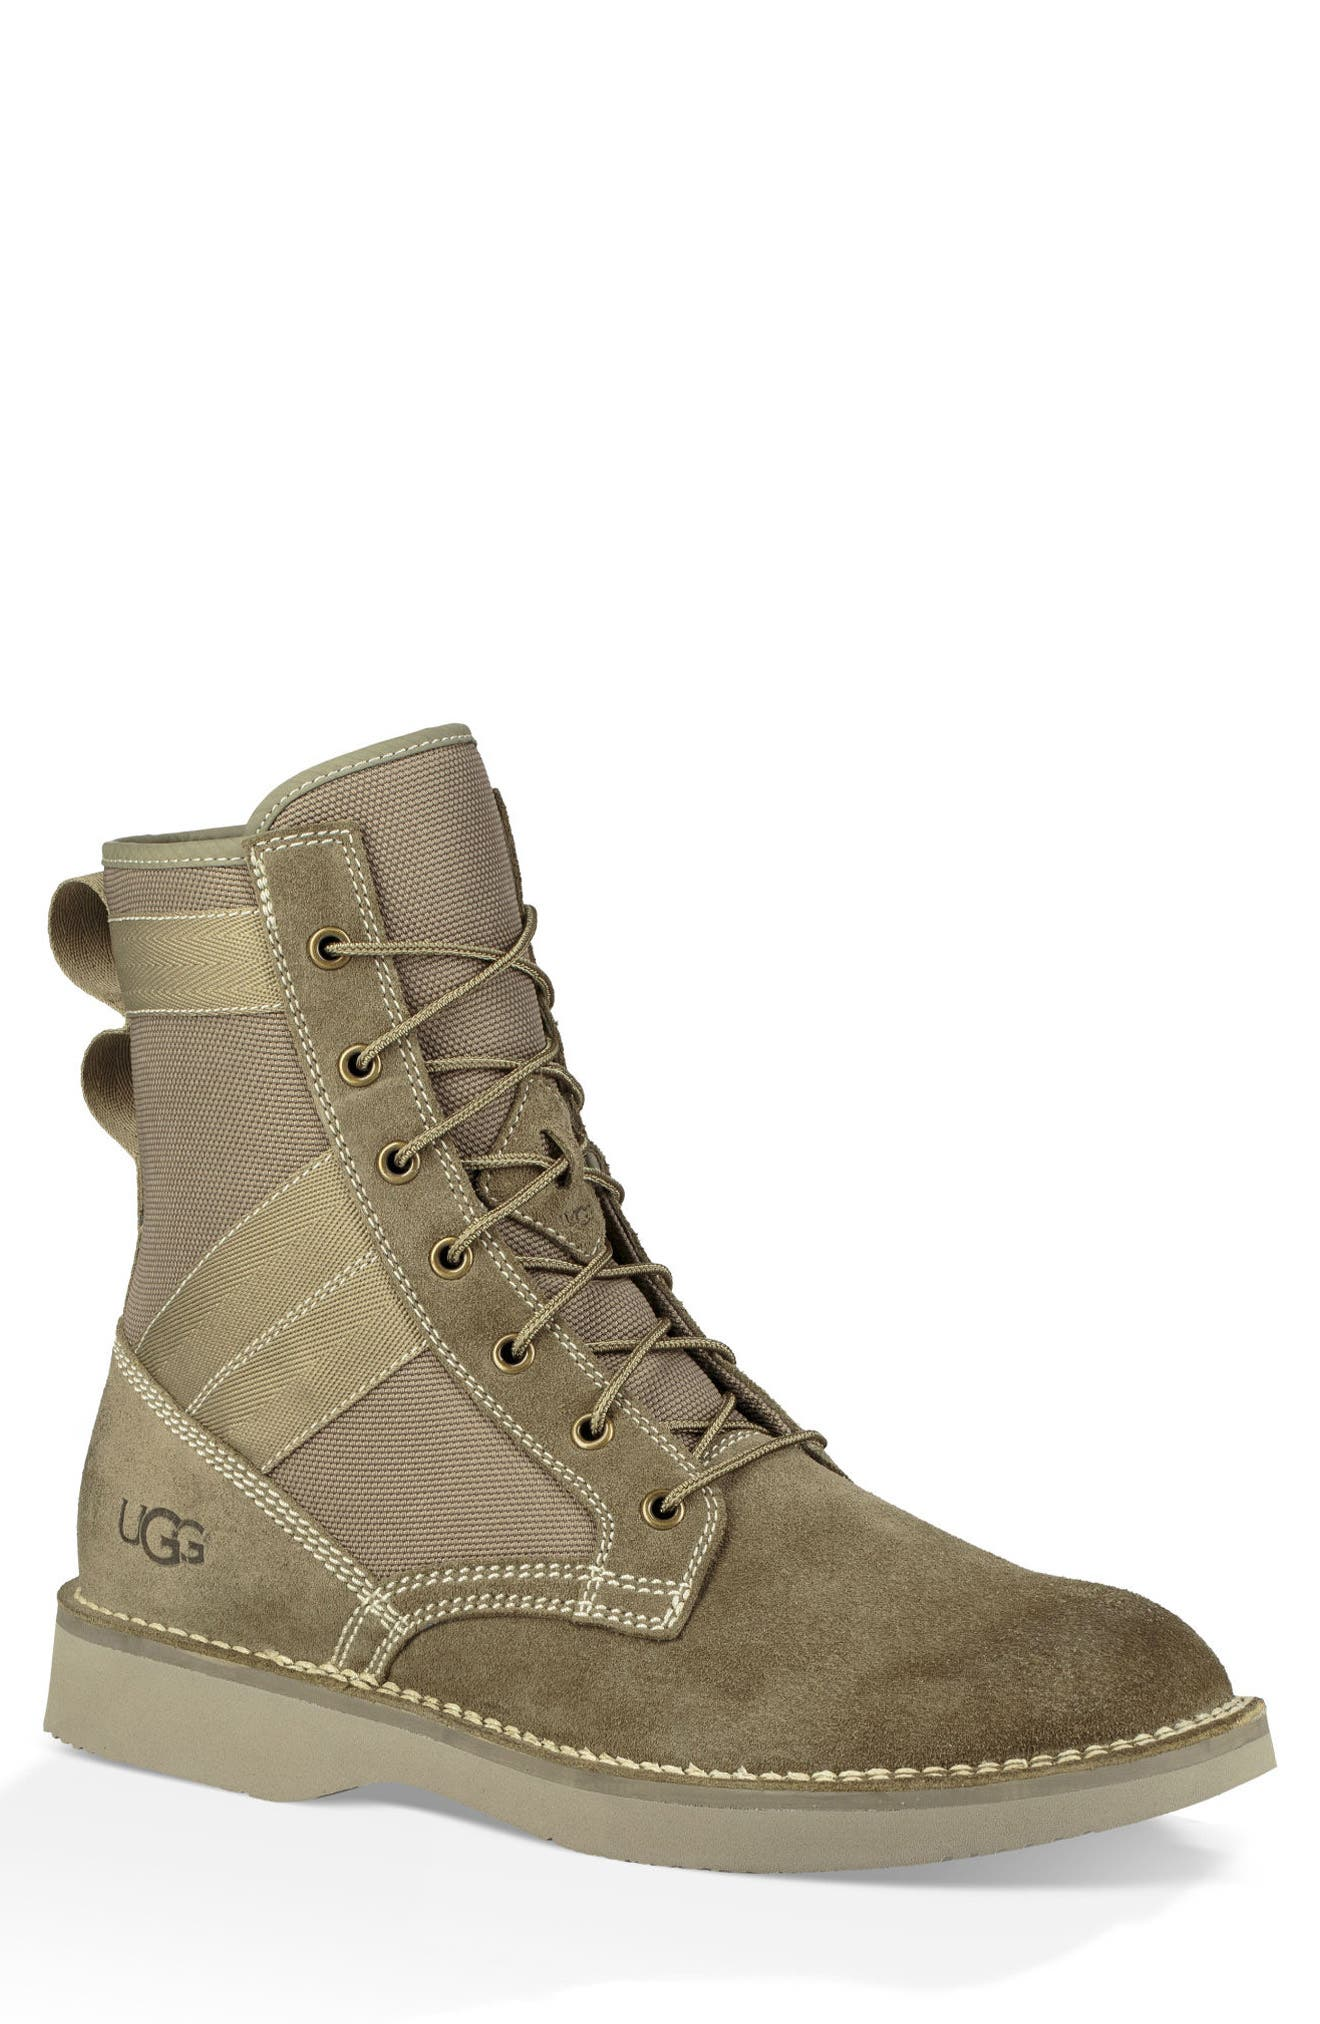 Camino Plain Toe Boot,                             Main thumbnail 1, color,                             TAUPE